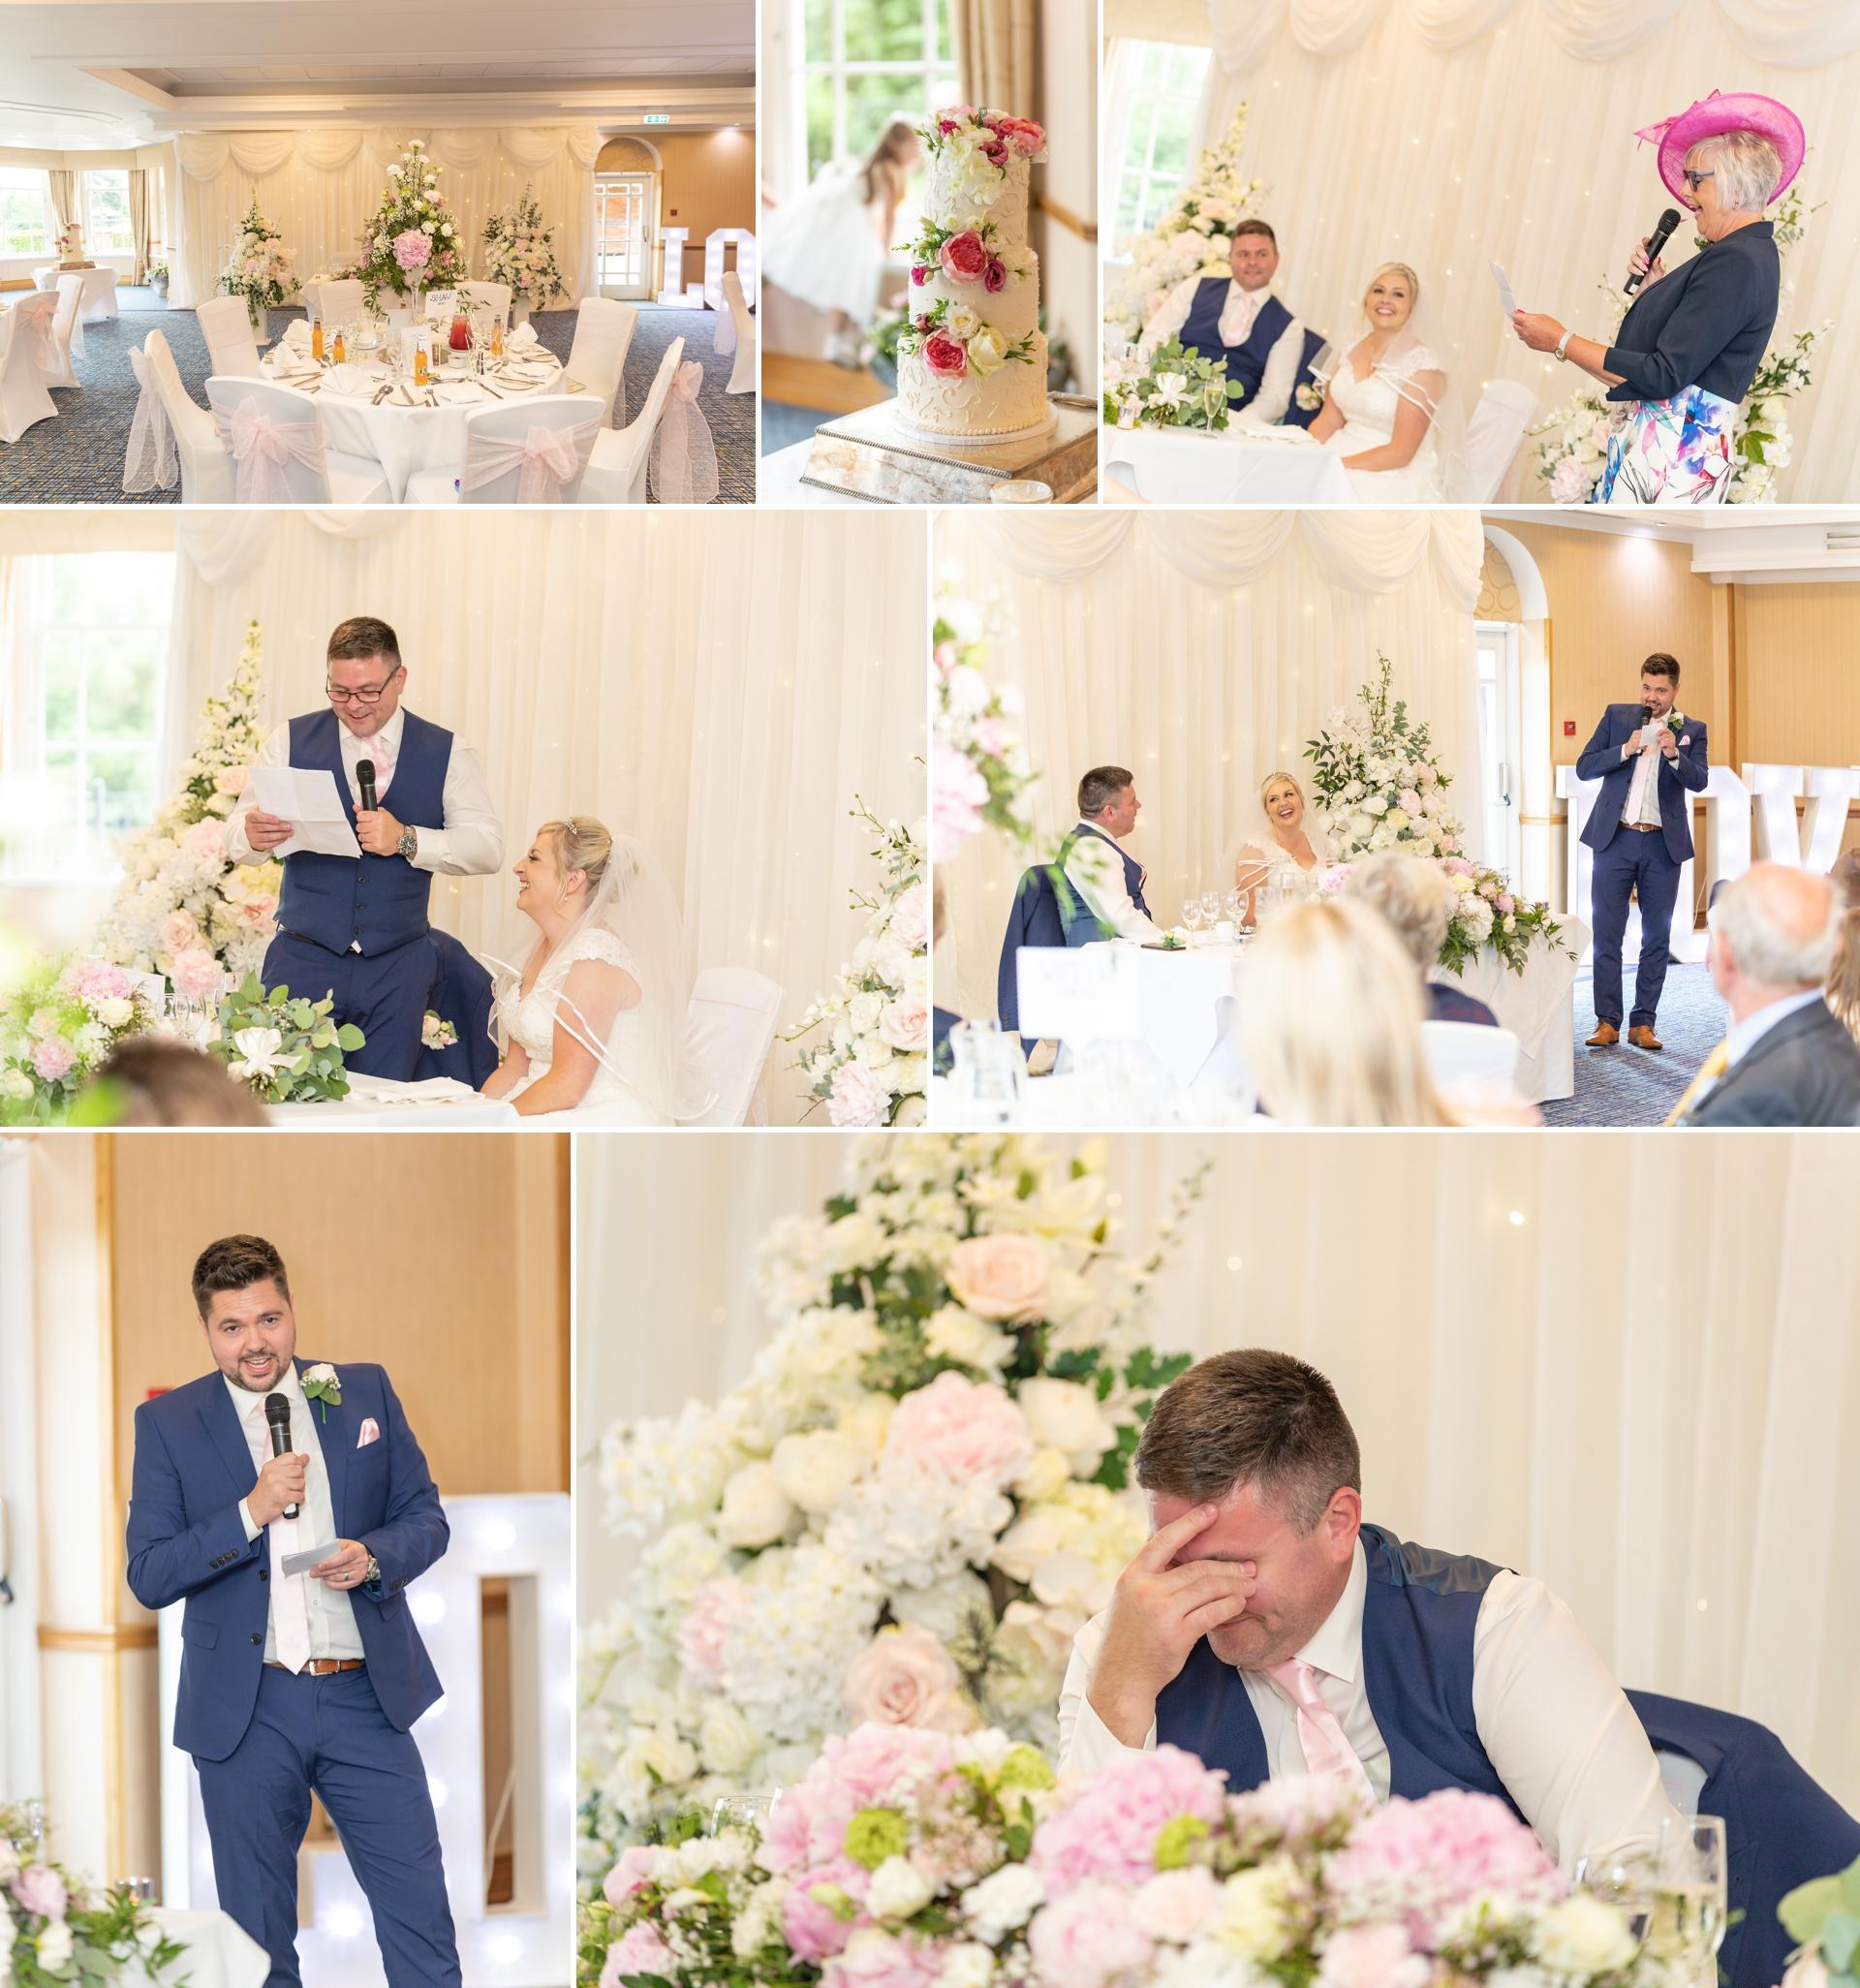 Speeches at Darren & Kerrys Ardencote Manor wedding